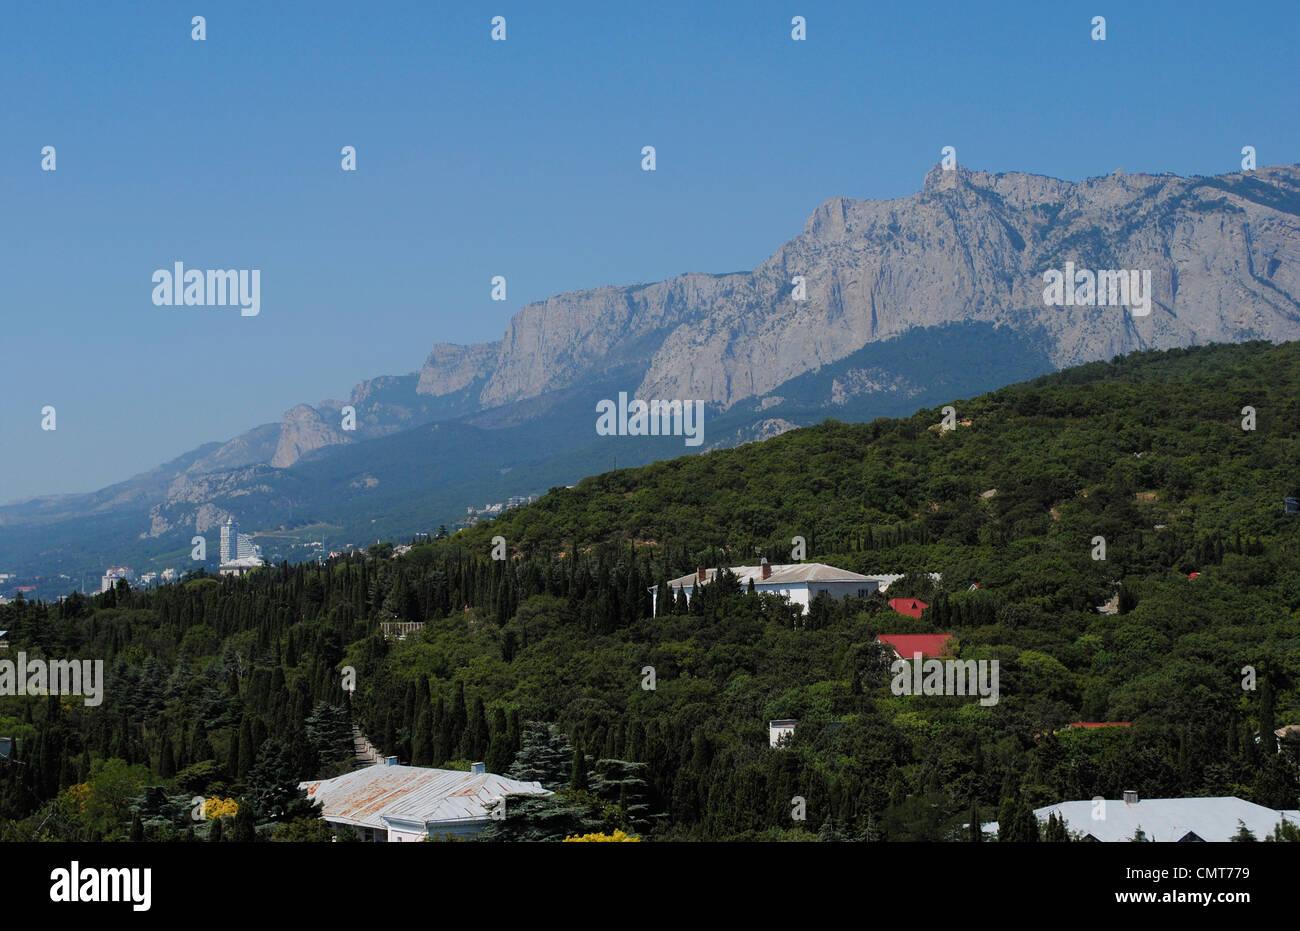 Ukraine. Autonomous Republic of Crimea. Crimean Mountains with Ai-Petri peak in the background. - Stock Image